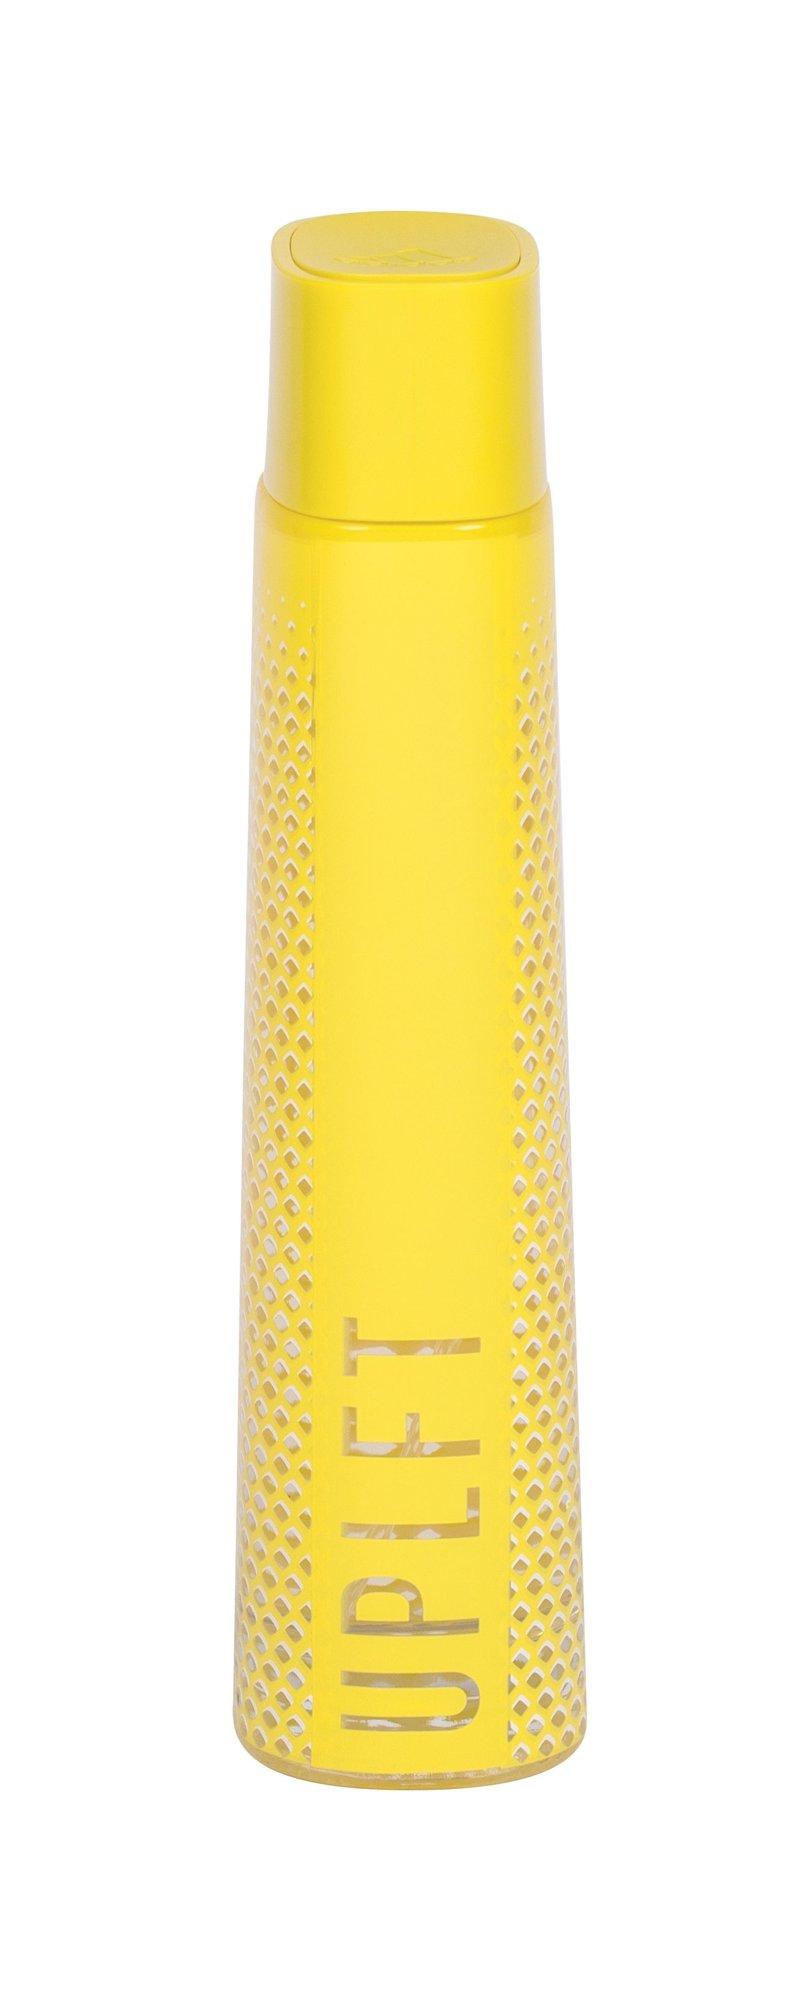 Adidas UPLIFT Eau de Toilette 100ml